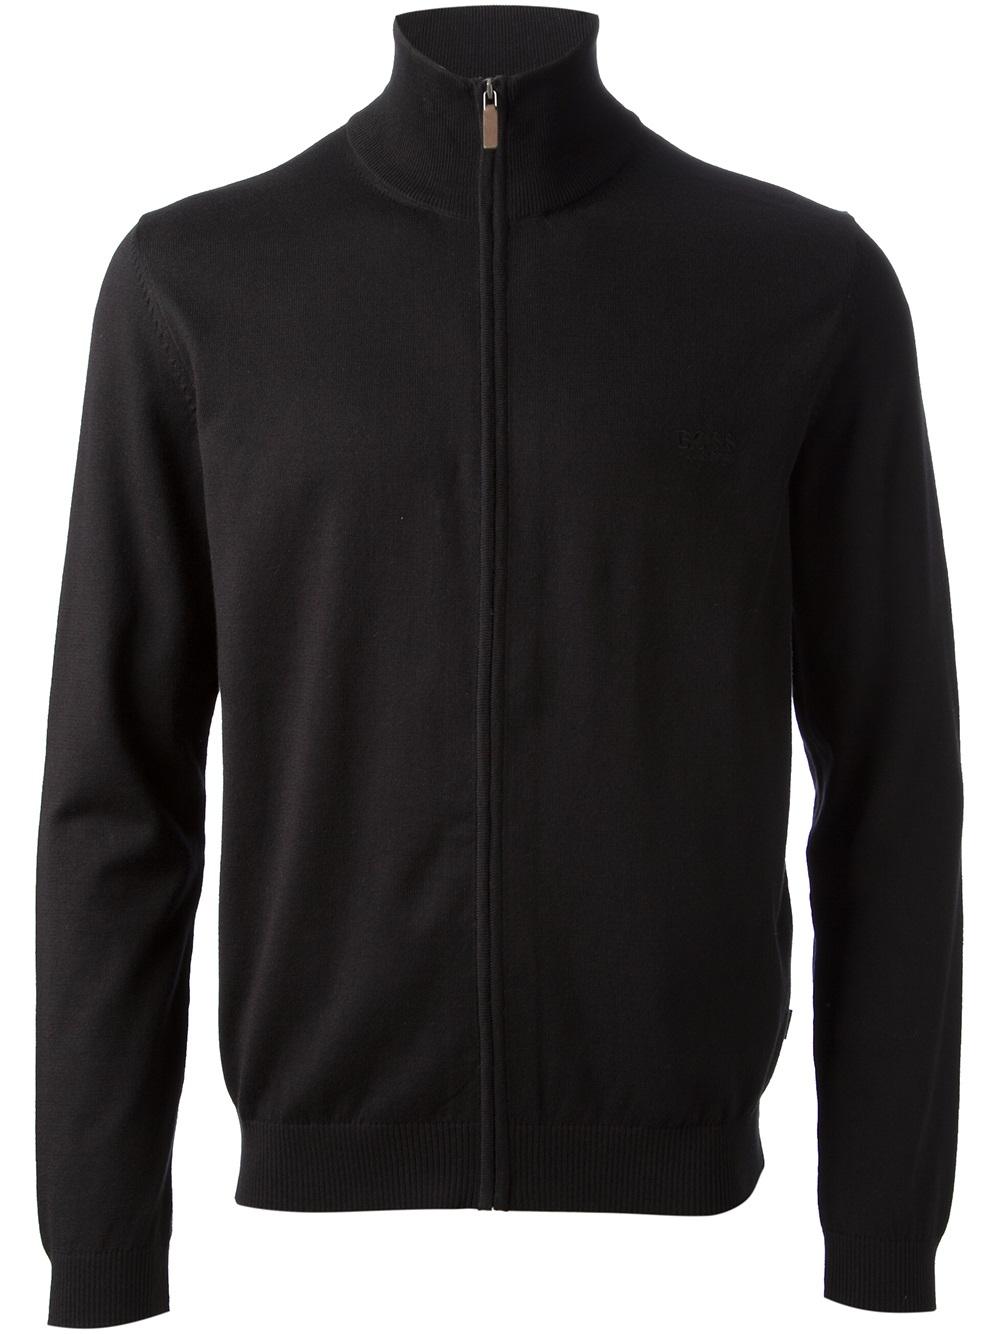 Csulb hoodie